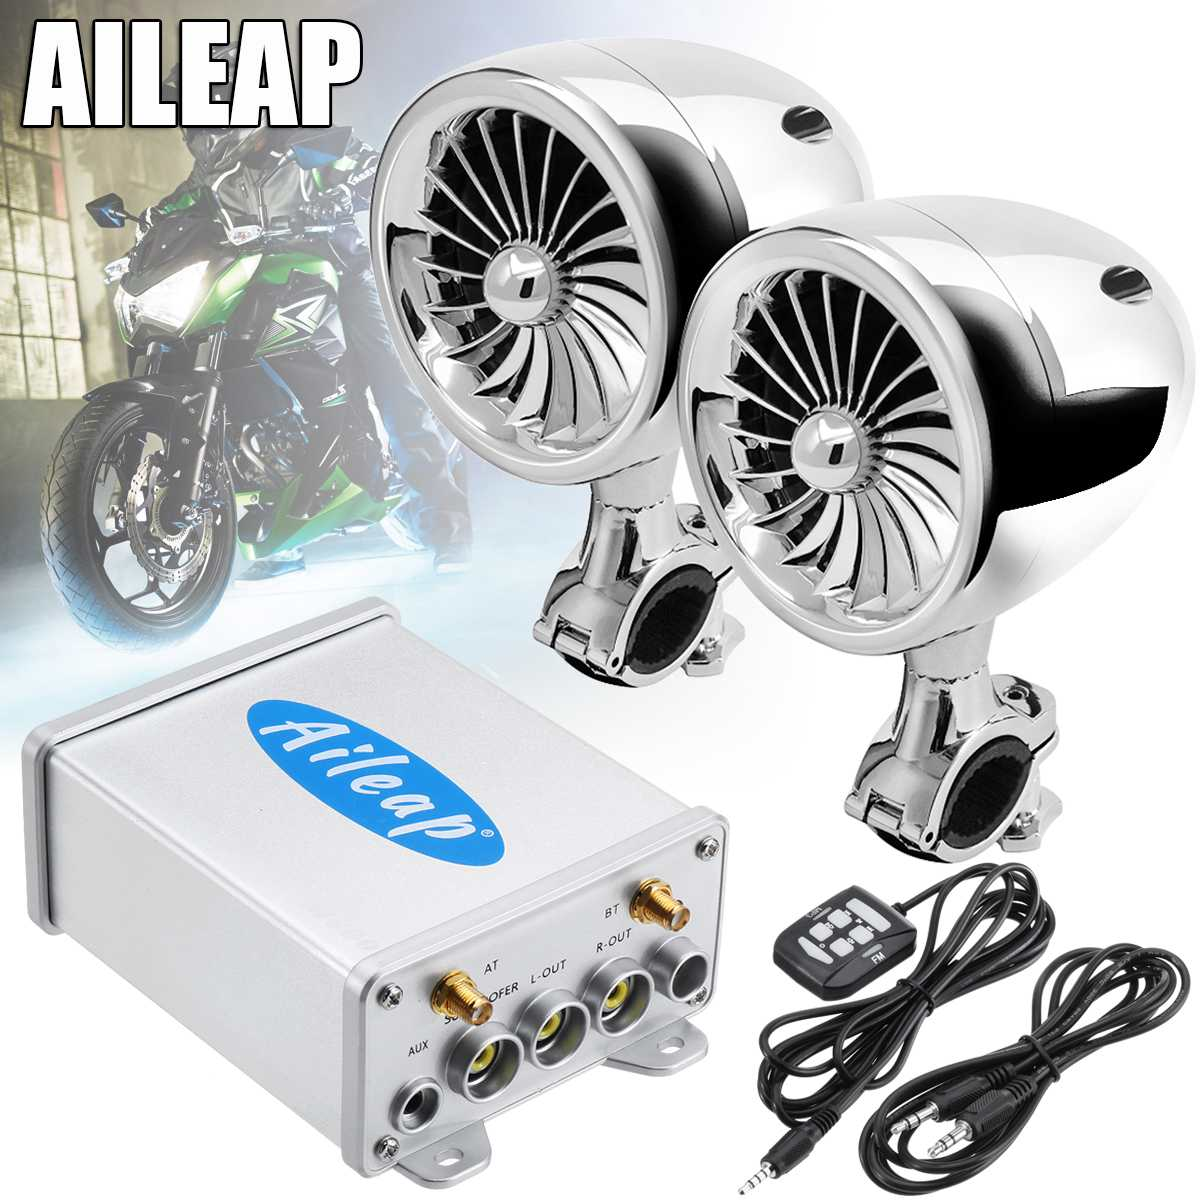 600W Wireless Motorcycle Audio Amplifier bluetooth Motorcycle Speaker  Adjustable ATV Stereo Speaker System AUX Radio